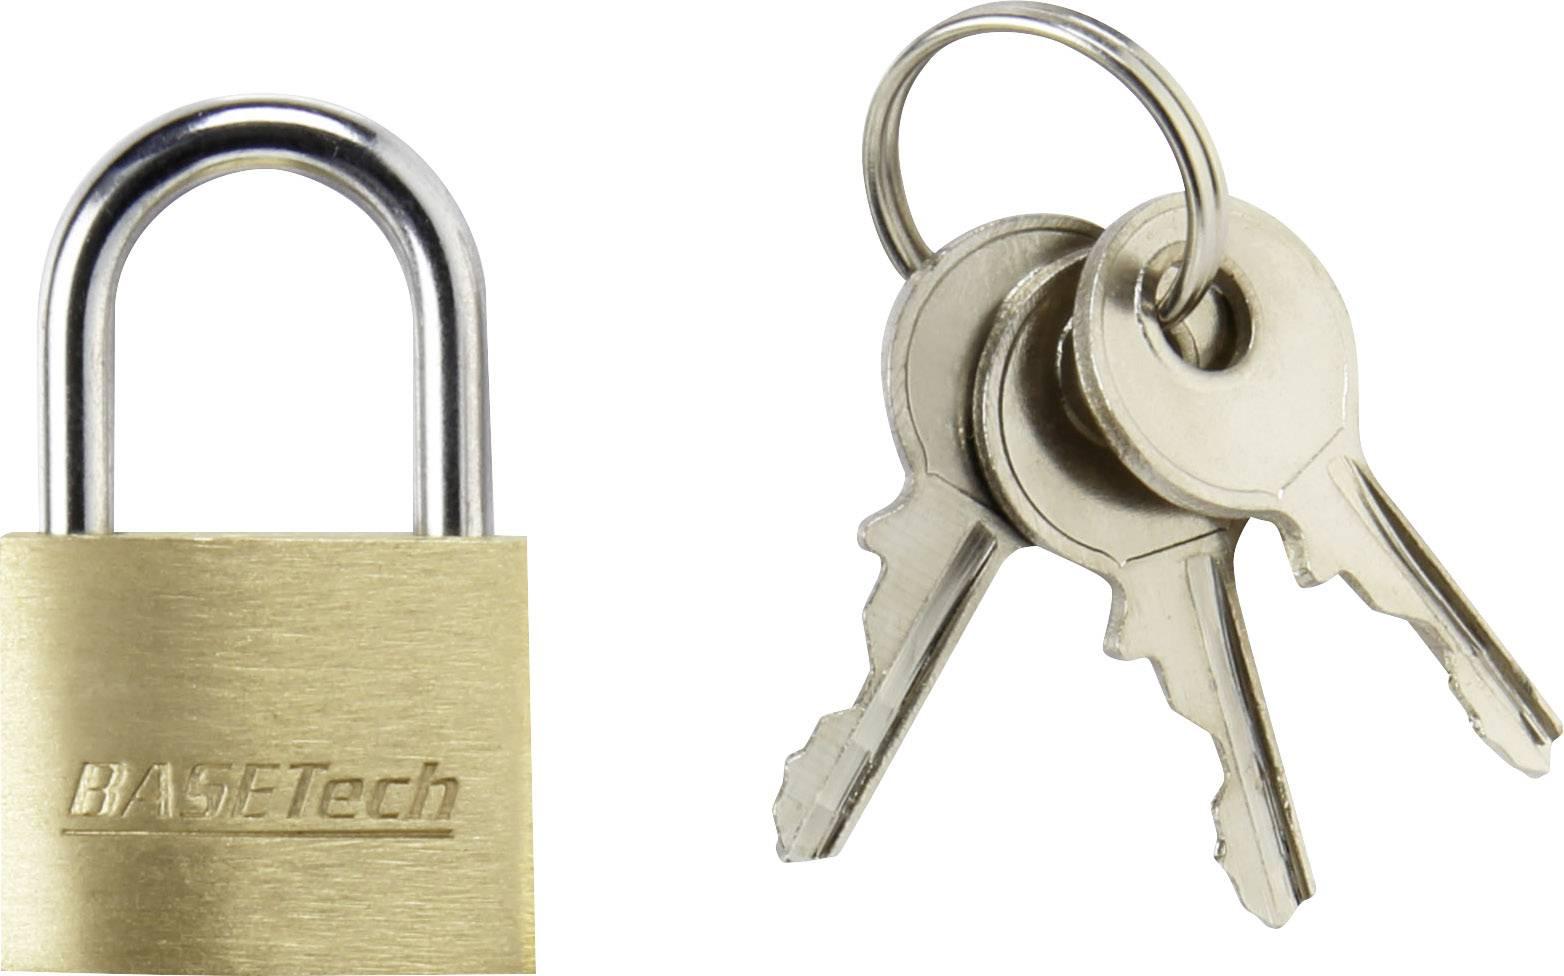 Visiaci zámok na kľúč Basetech 1362630, 19.7 mm, mosadz